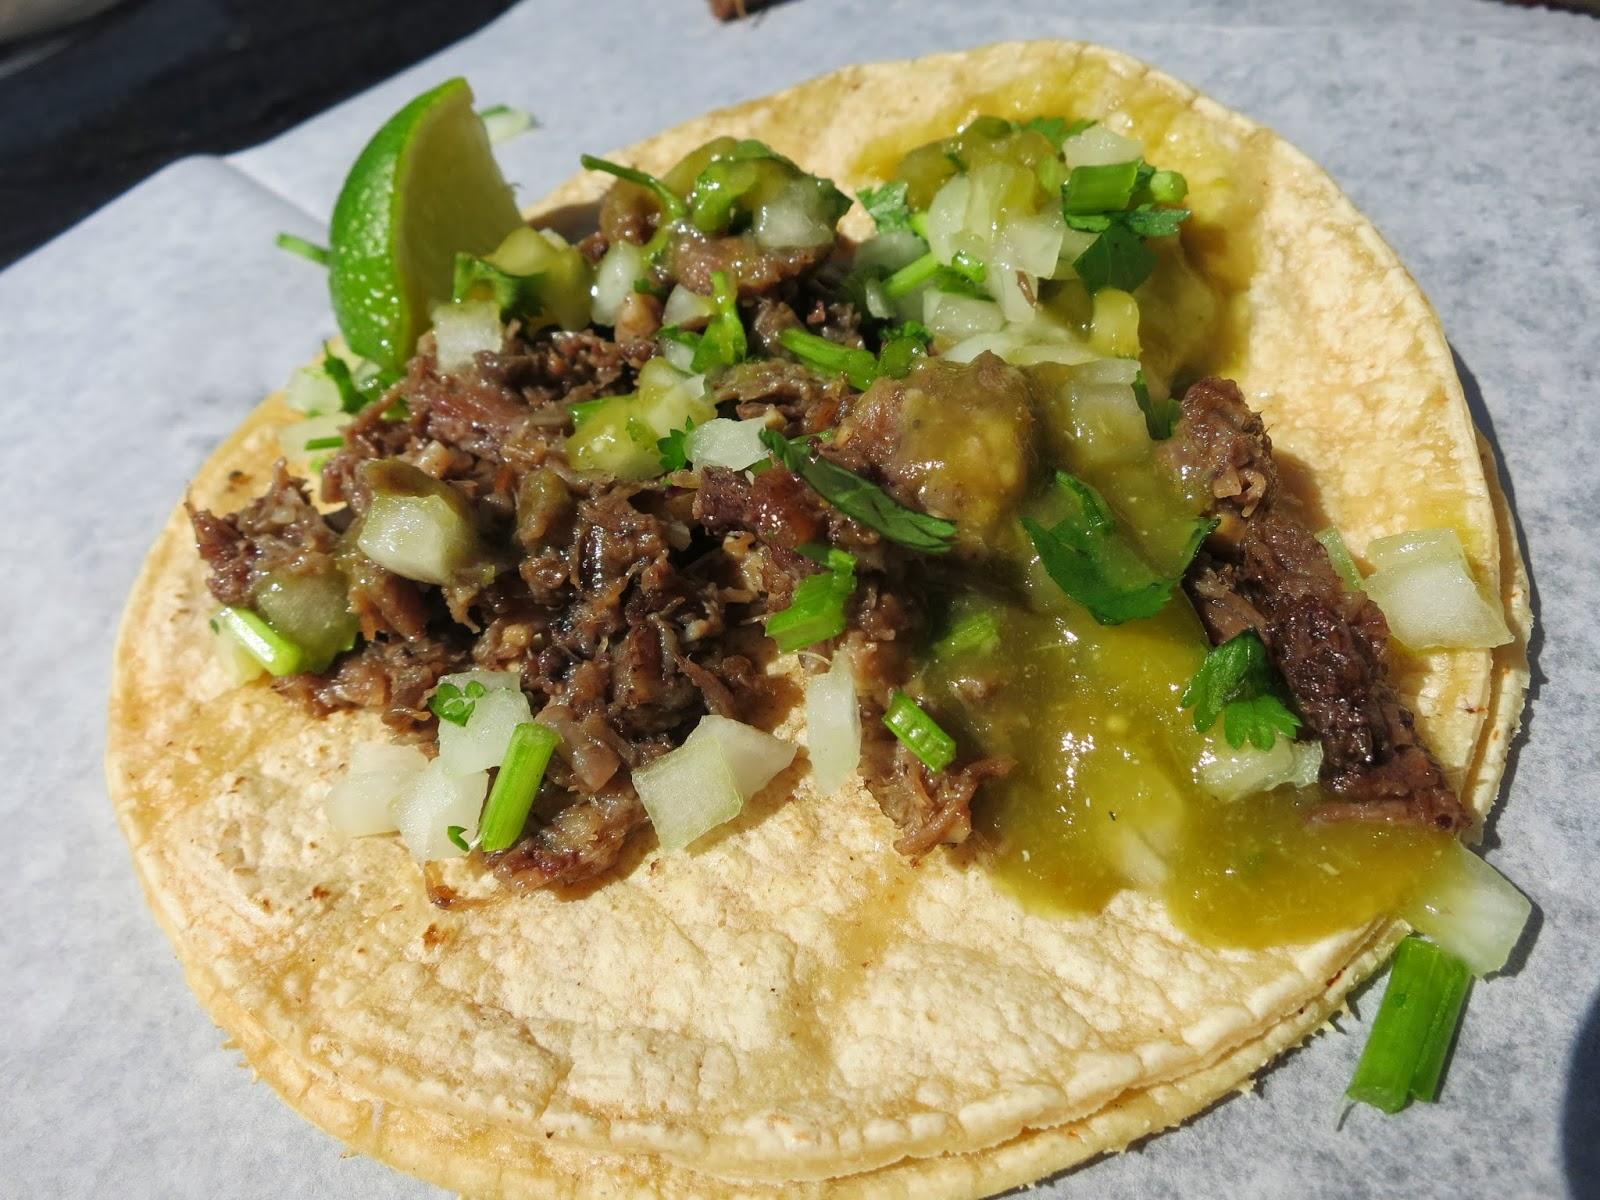 Tacos El Torito | The Chicago Taco Tour